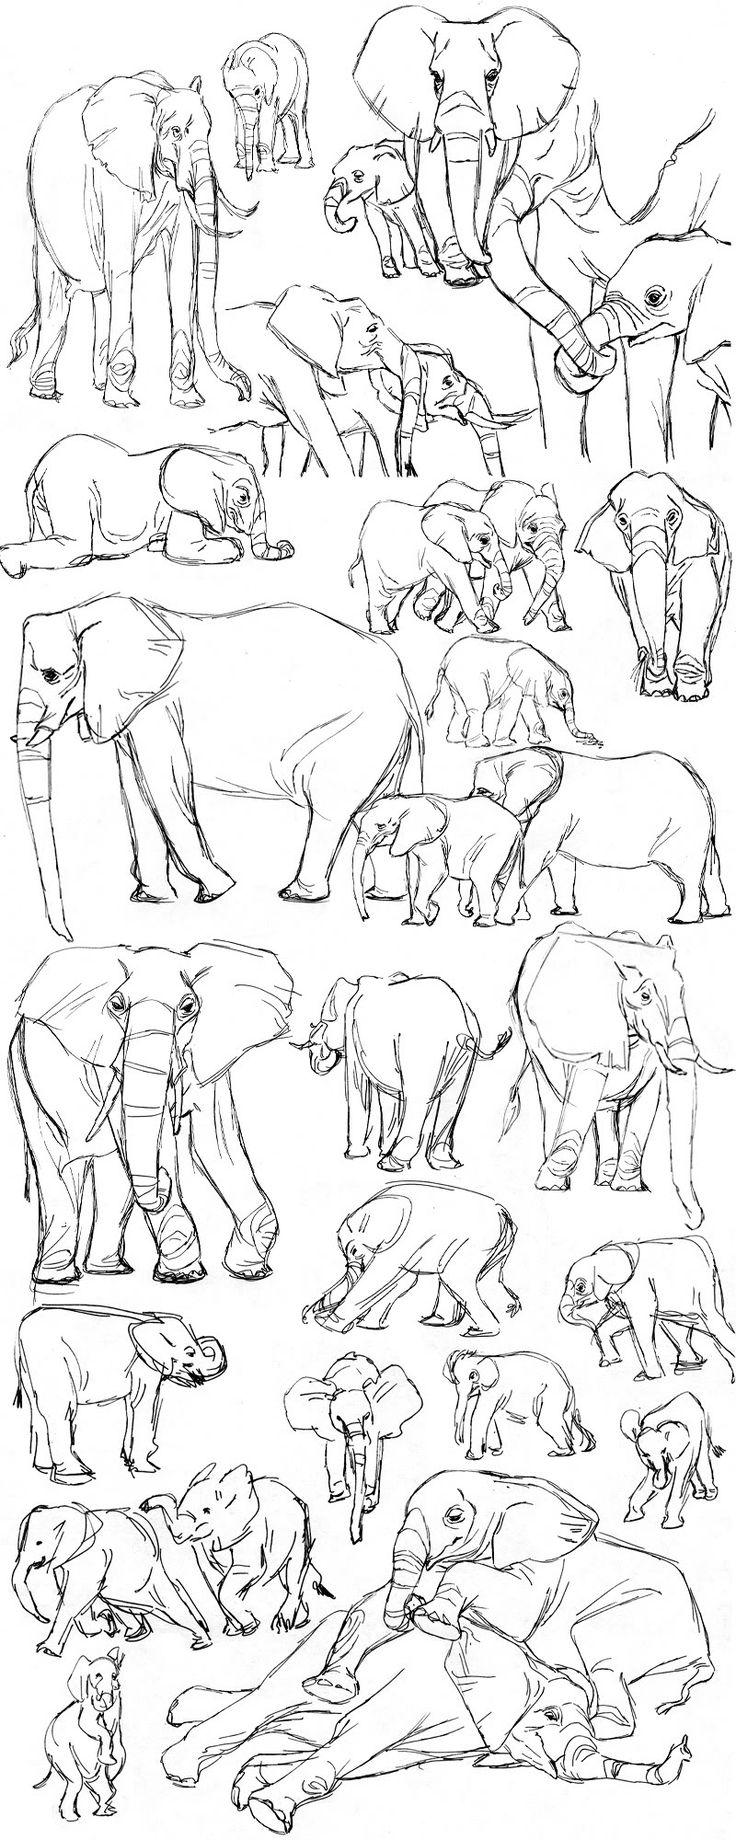 Blog of Boris Draw elephants like an artist!  Art Ed Central loves!